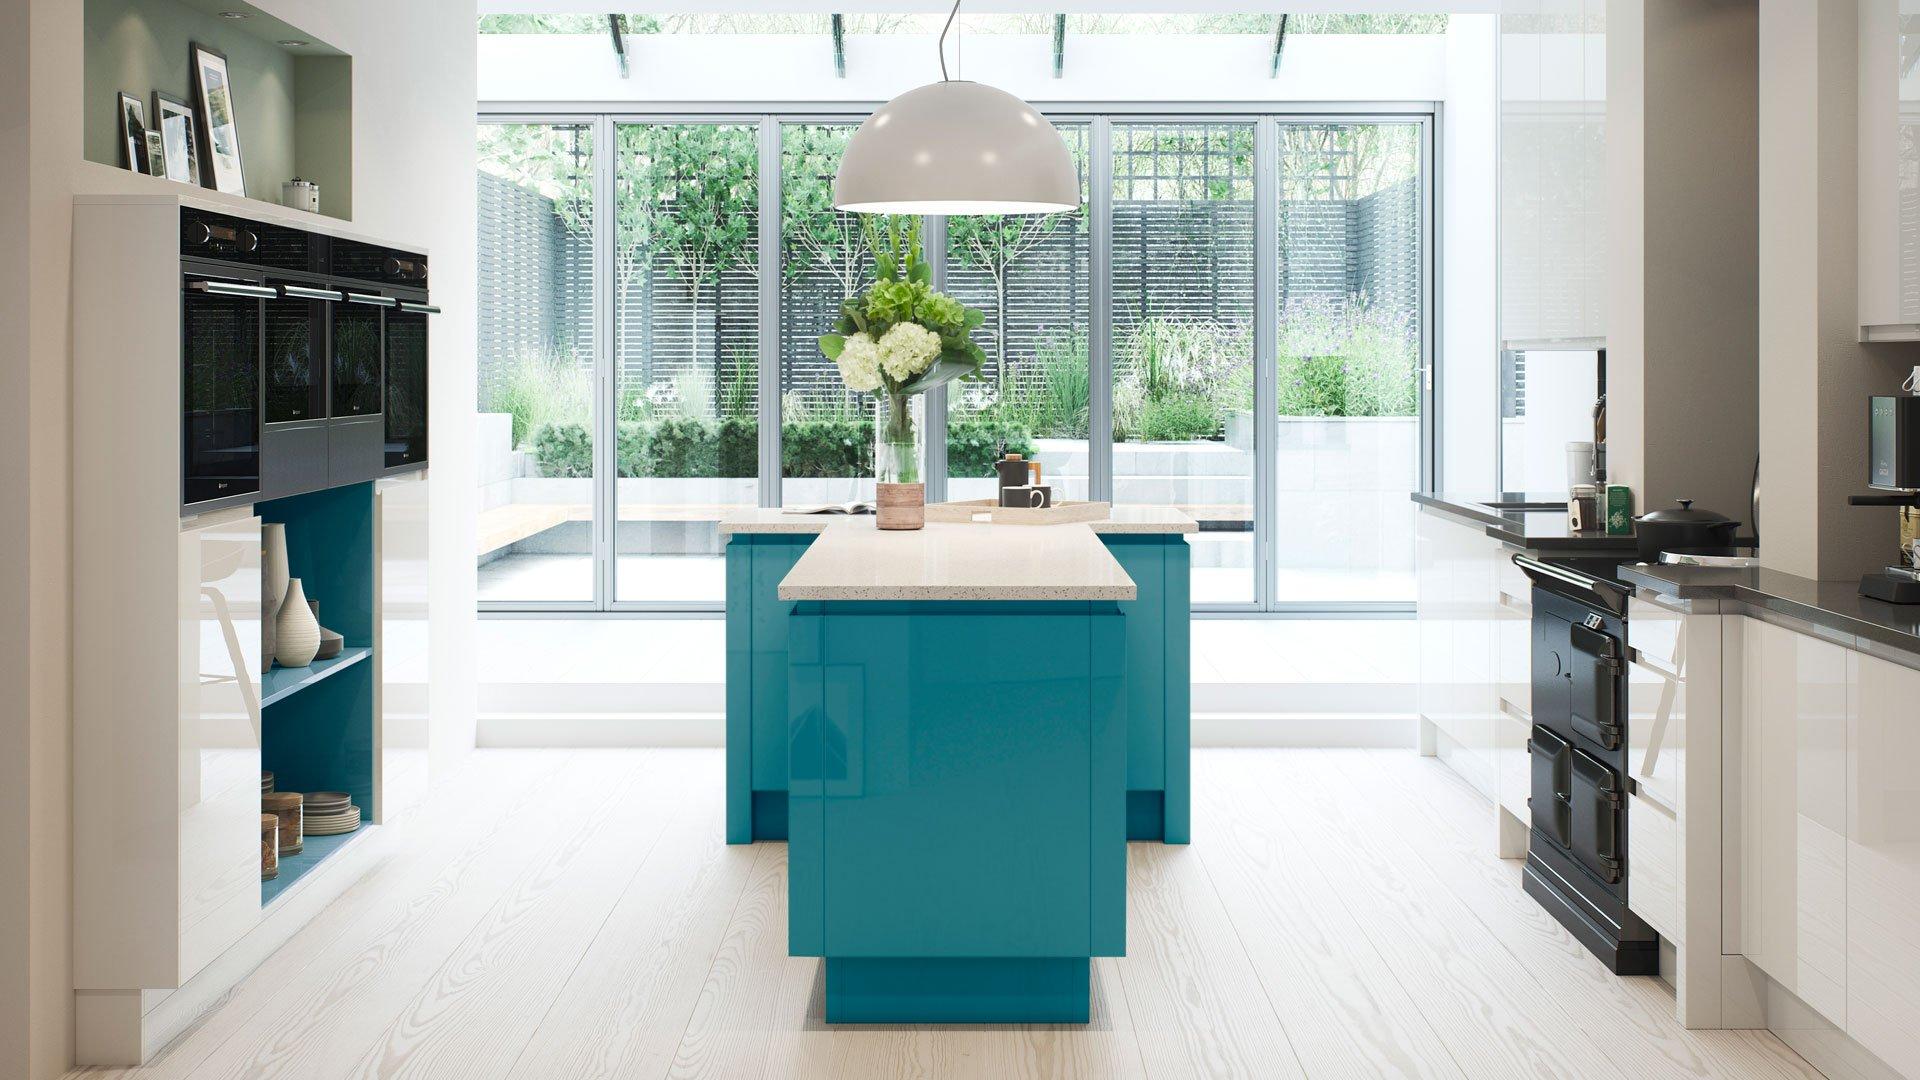 Multiwood Welford - Bright White & Sky Blue Kitchen